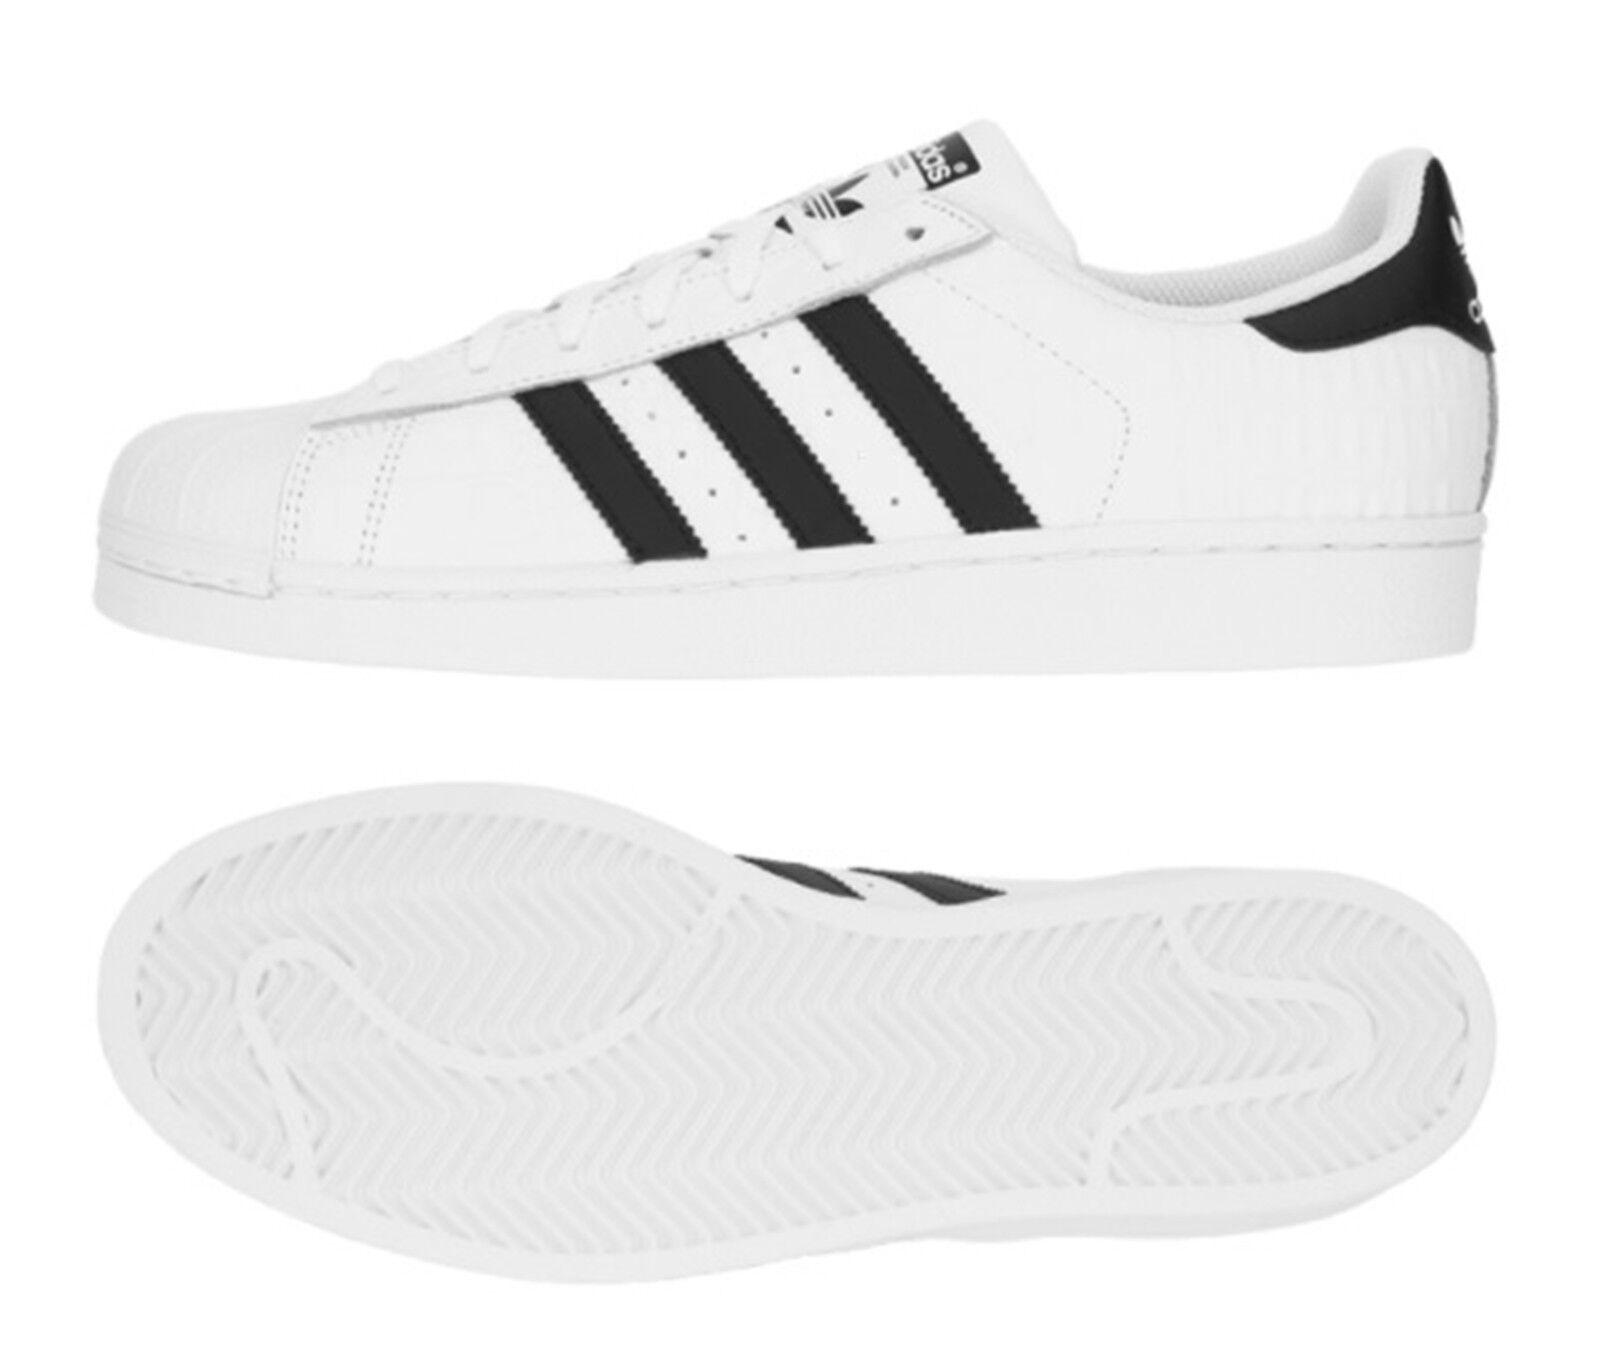 Adidas Men Originals Superstar Training shoes White Running GYM Sneakers BZ0198